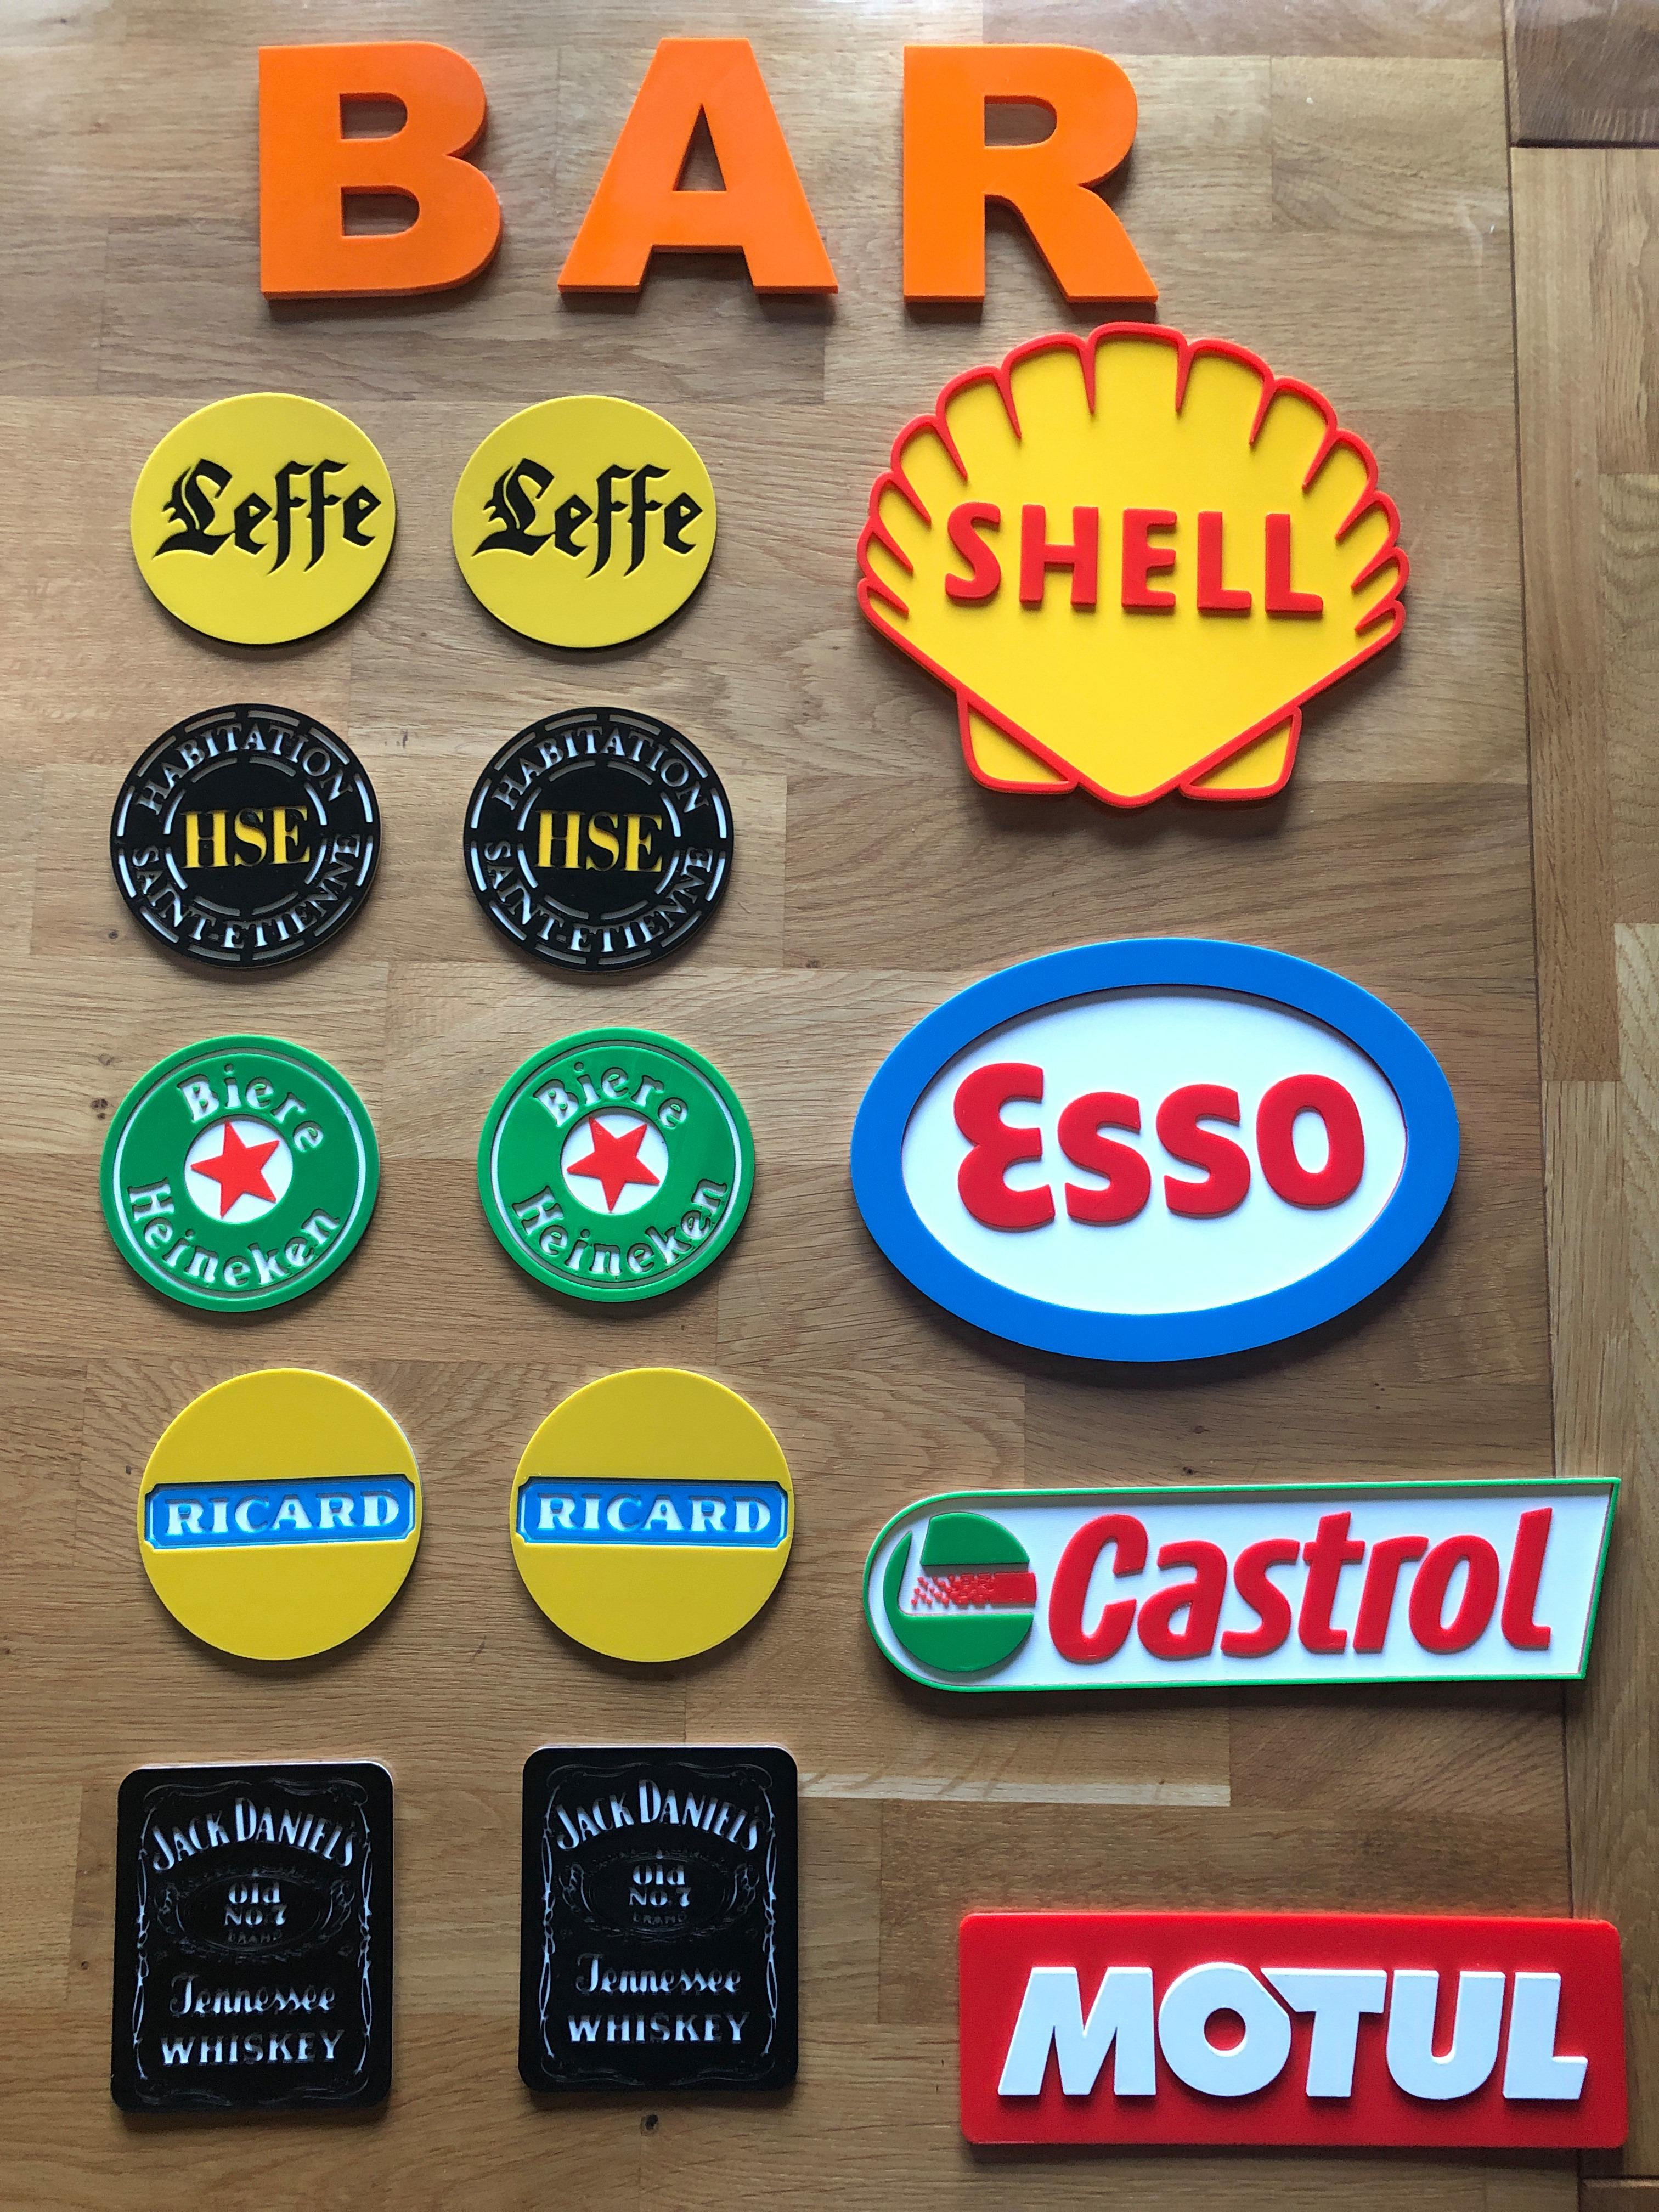 dessous et plaque.jpg Download free STL file HSE coaster • Design to 3D print, fantibus14